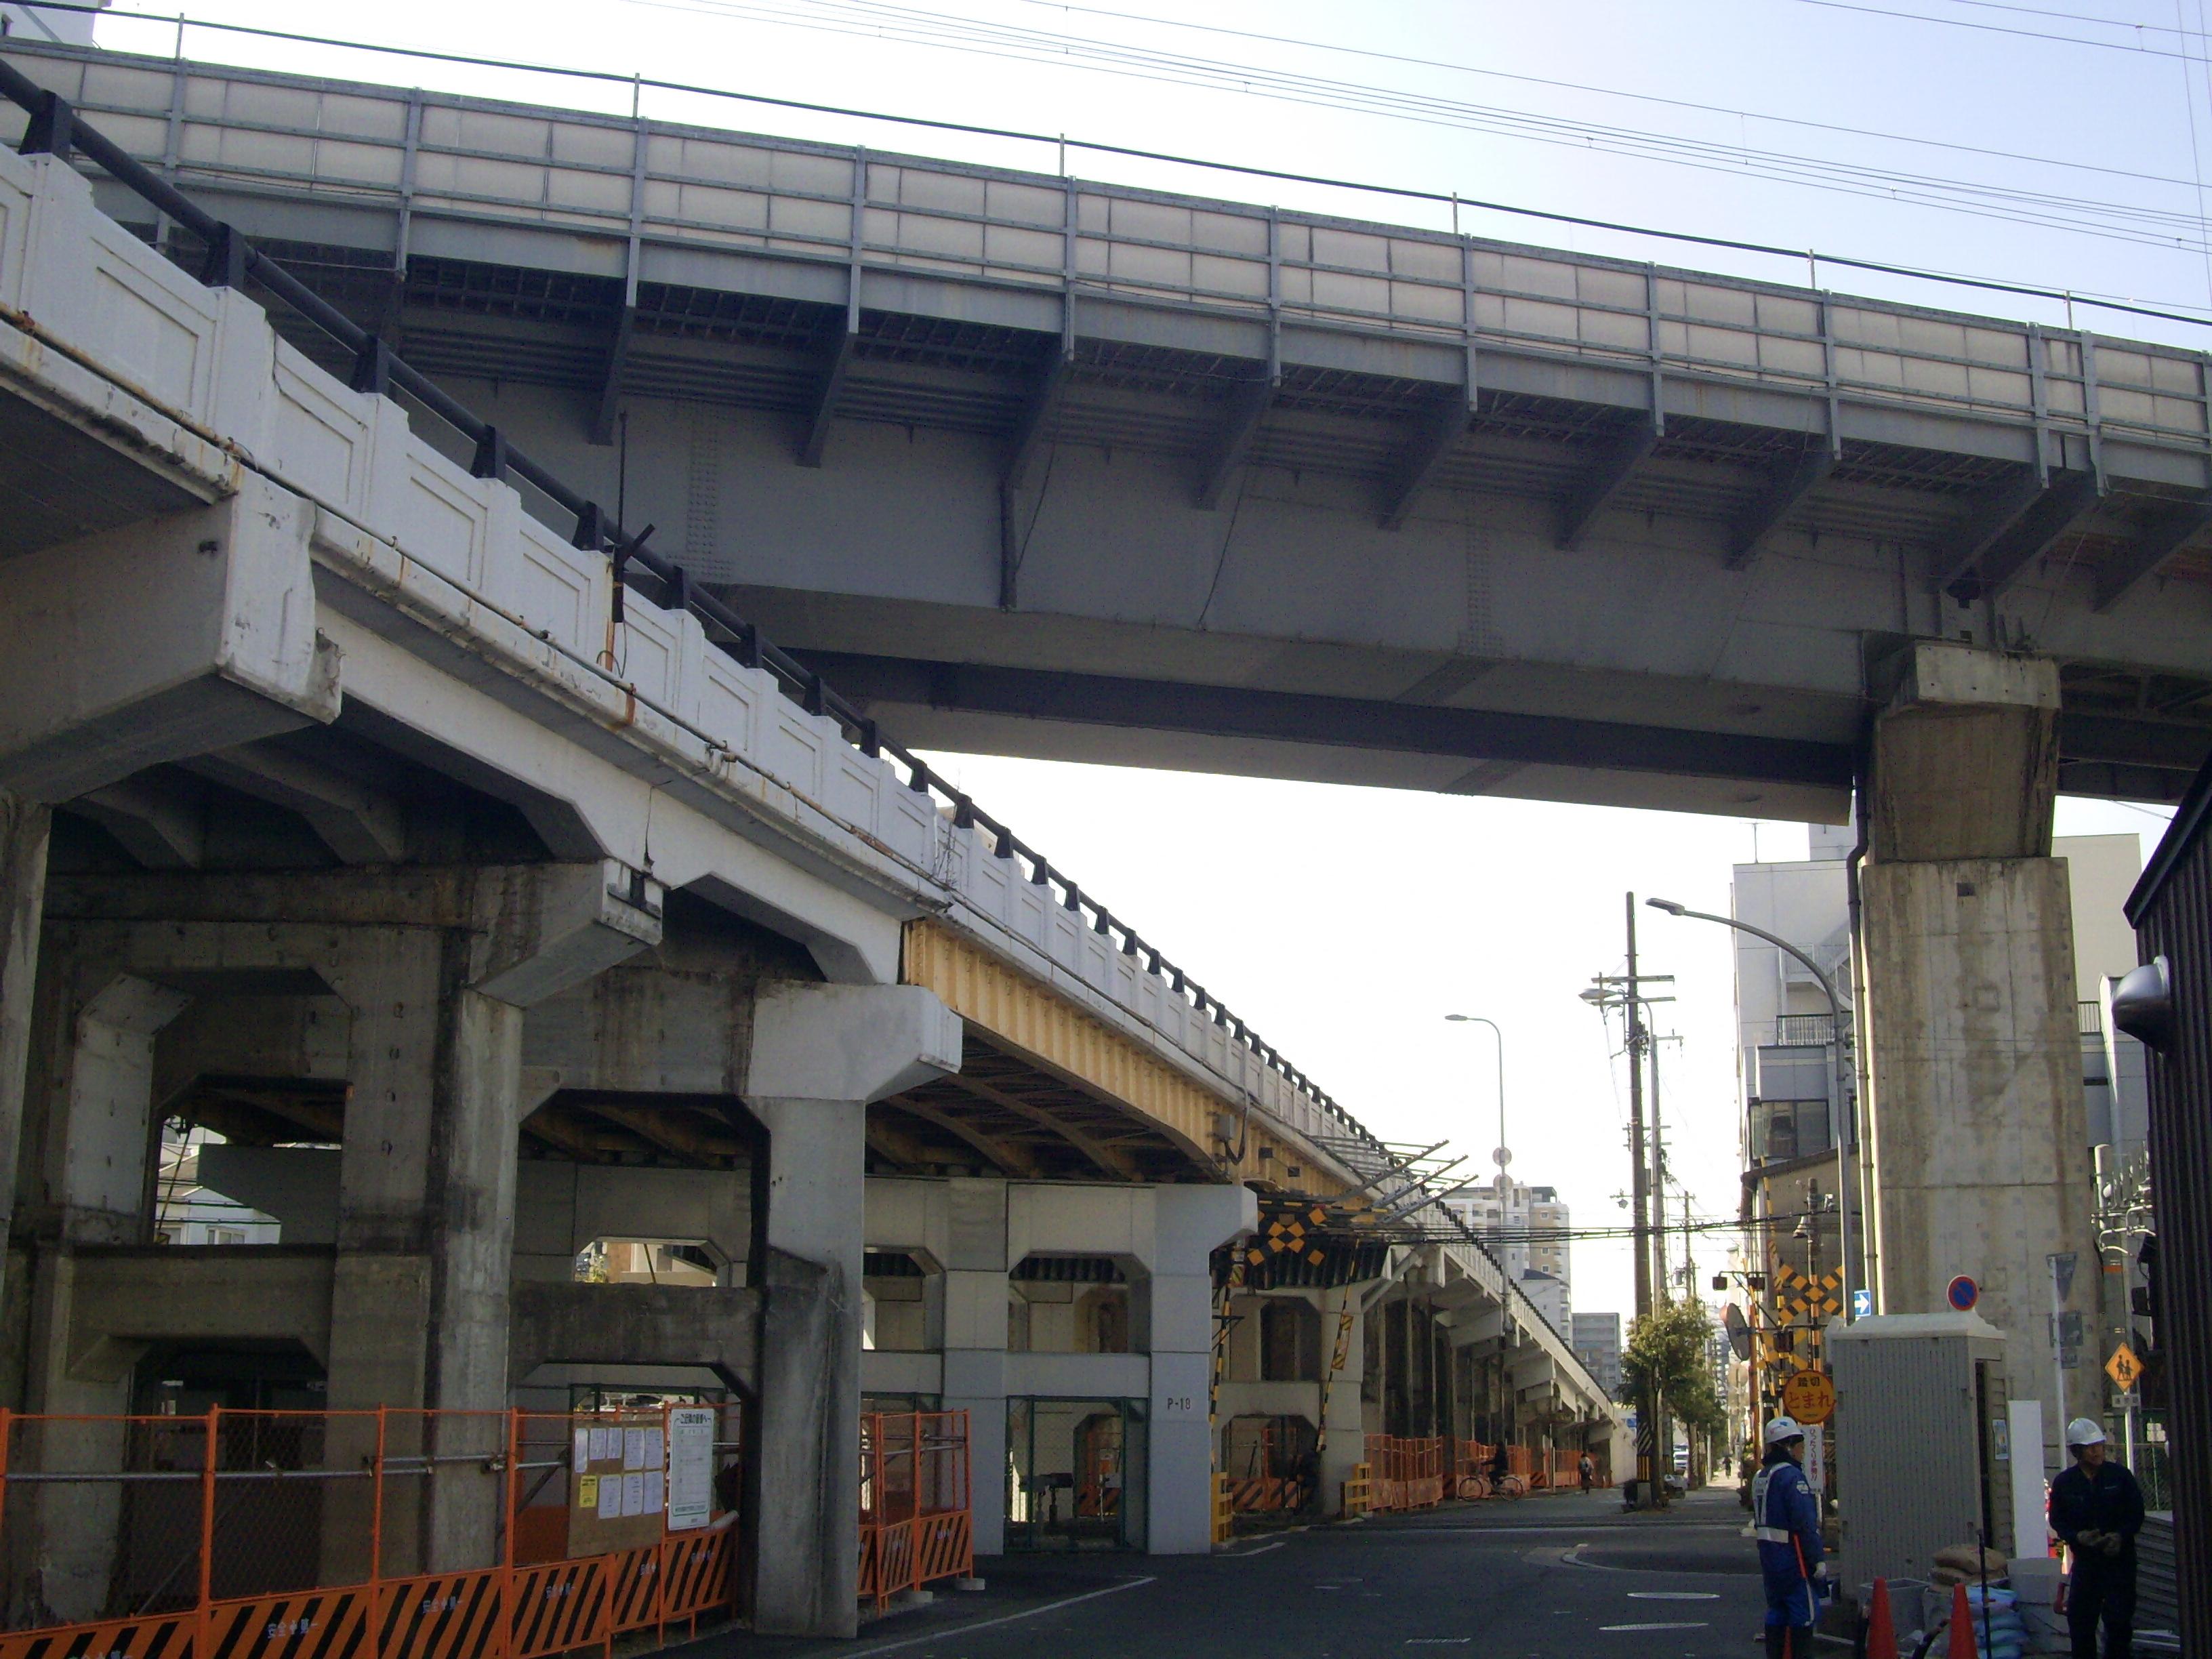 https://upload.wikimedia.org/wikipedia/commons/d/df/Sanyo_Shinkansen_Mitsuya-%E2%85%A1_Bv_01.jpg